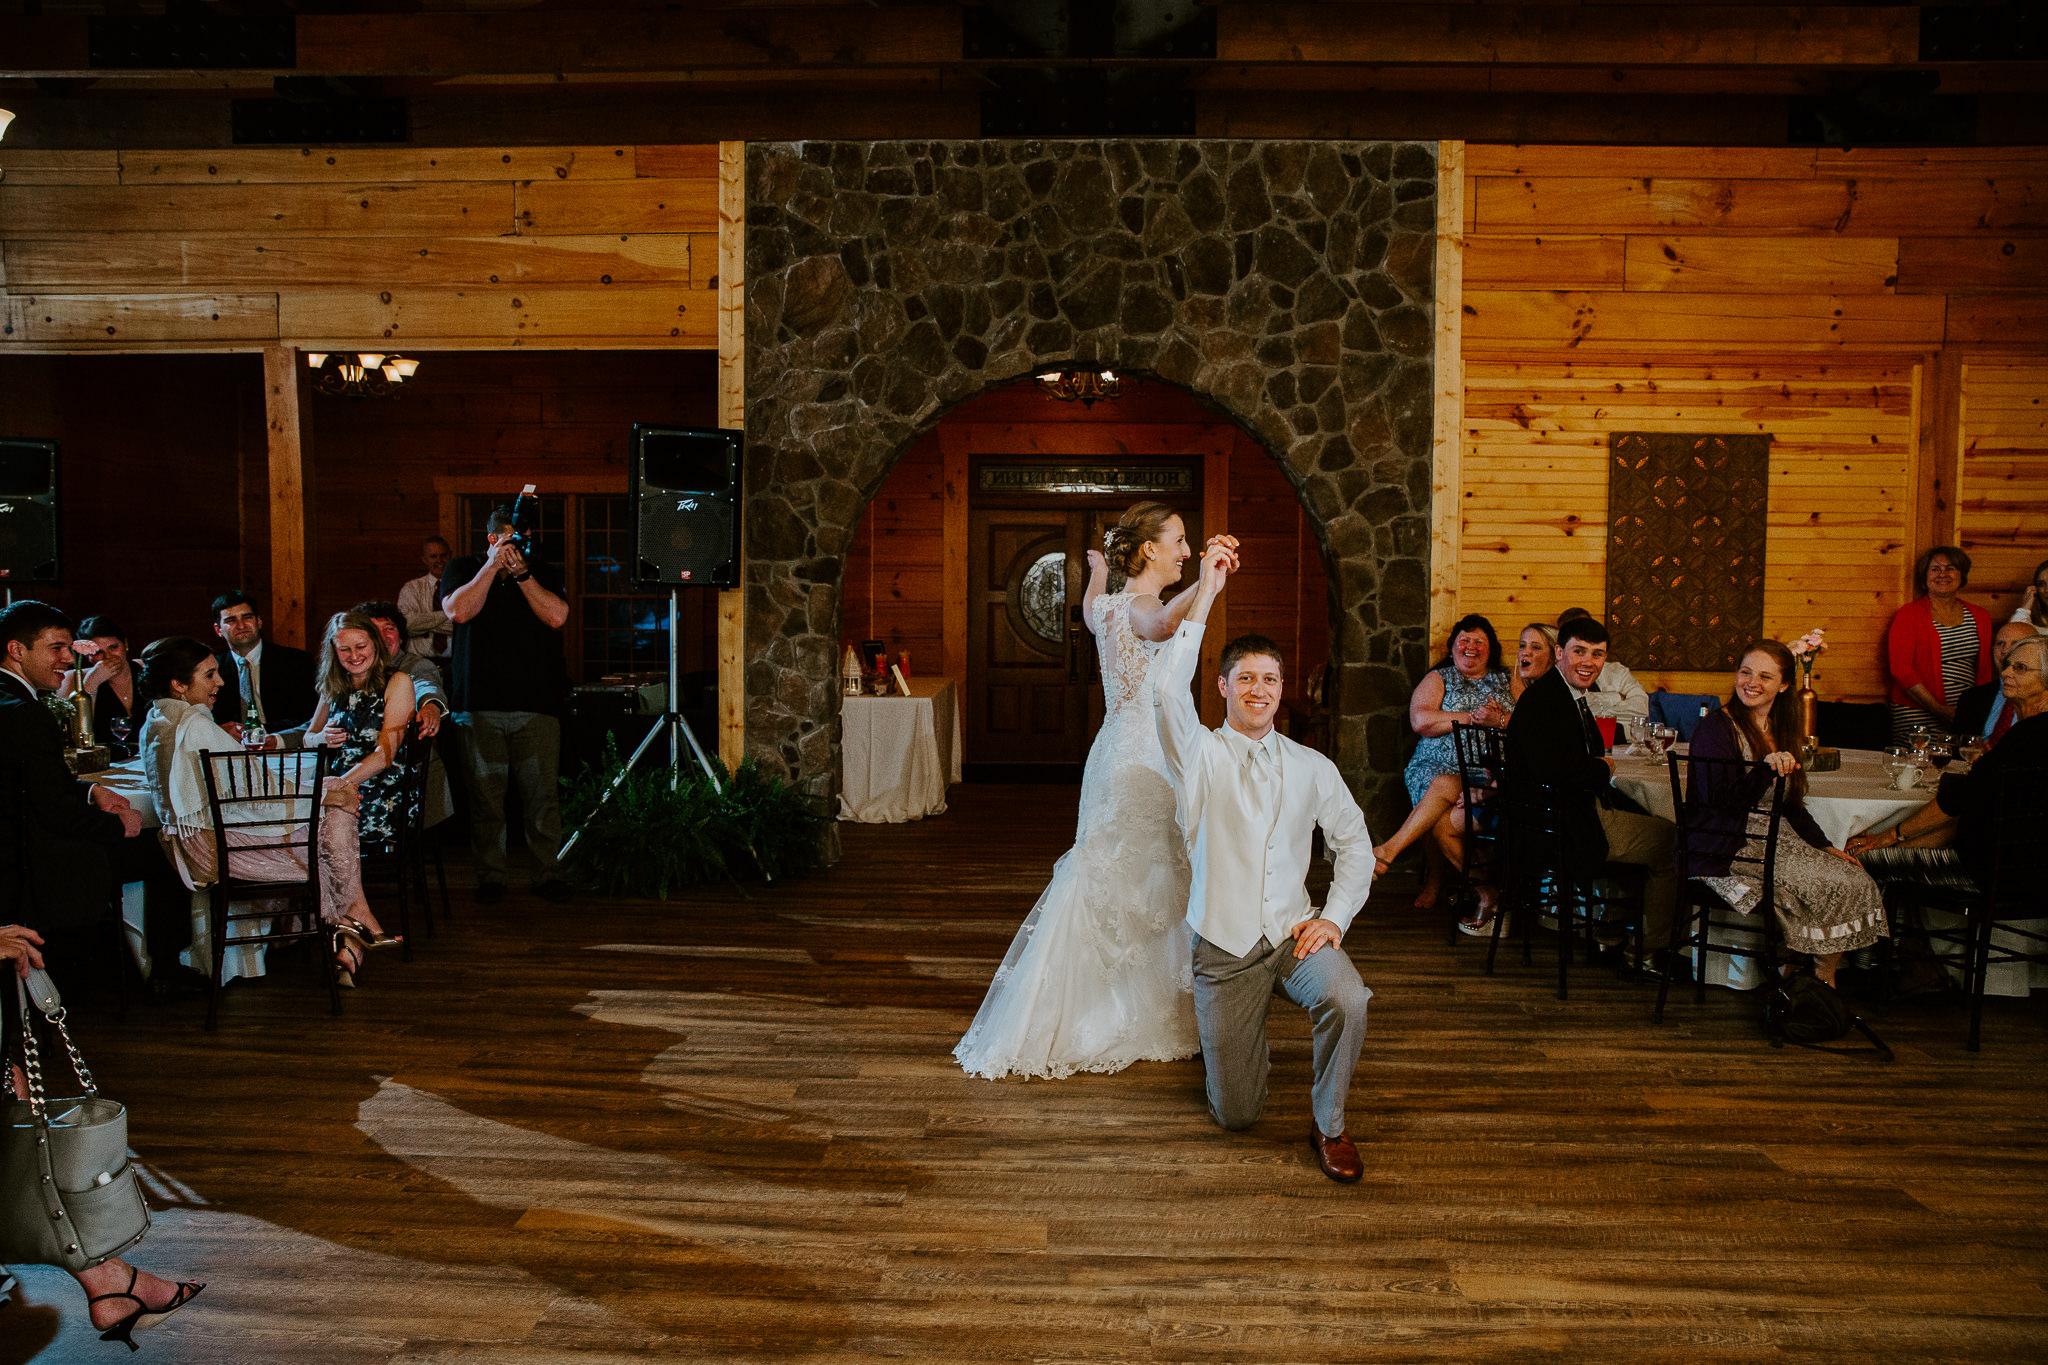 House Mountain Inn - Weddings - Lexington - Virginia - Best Wedding Photographer - Pat Cori Photography-73.jpg